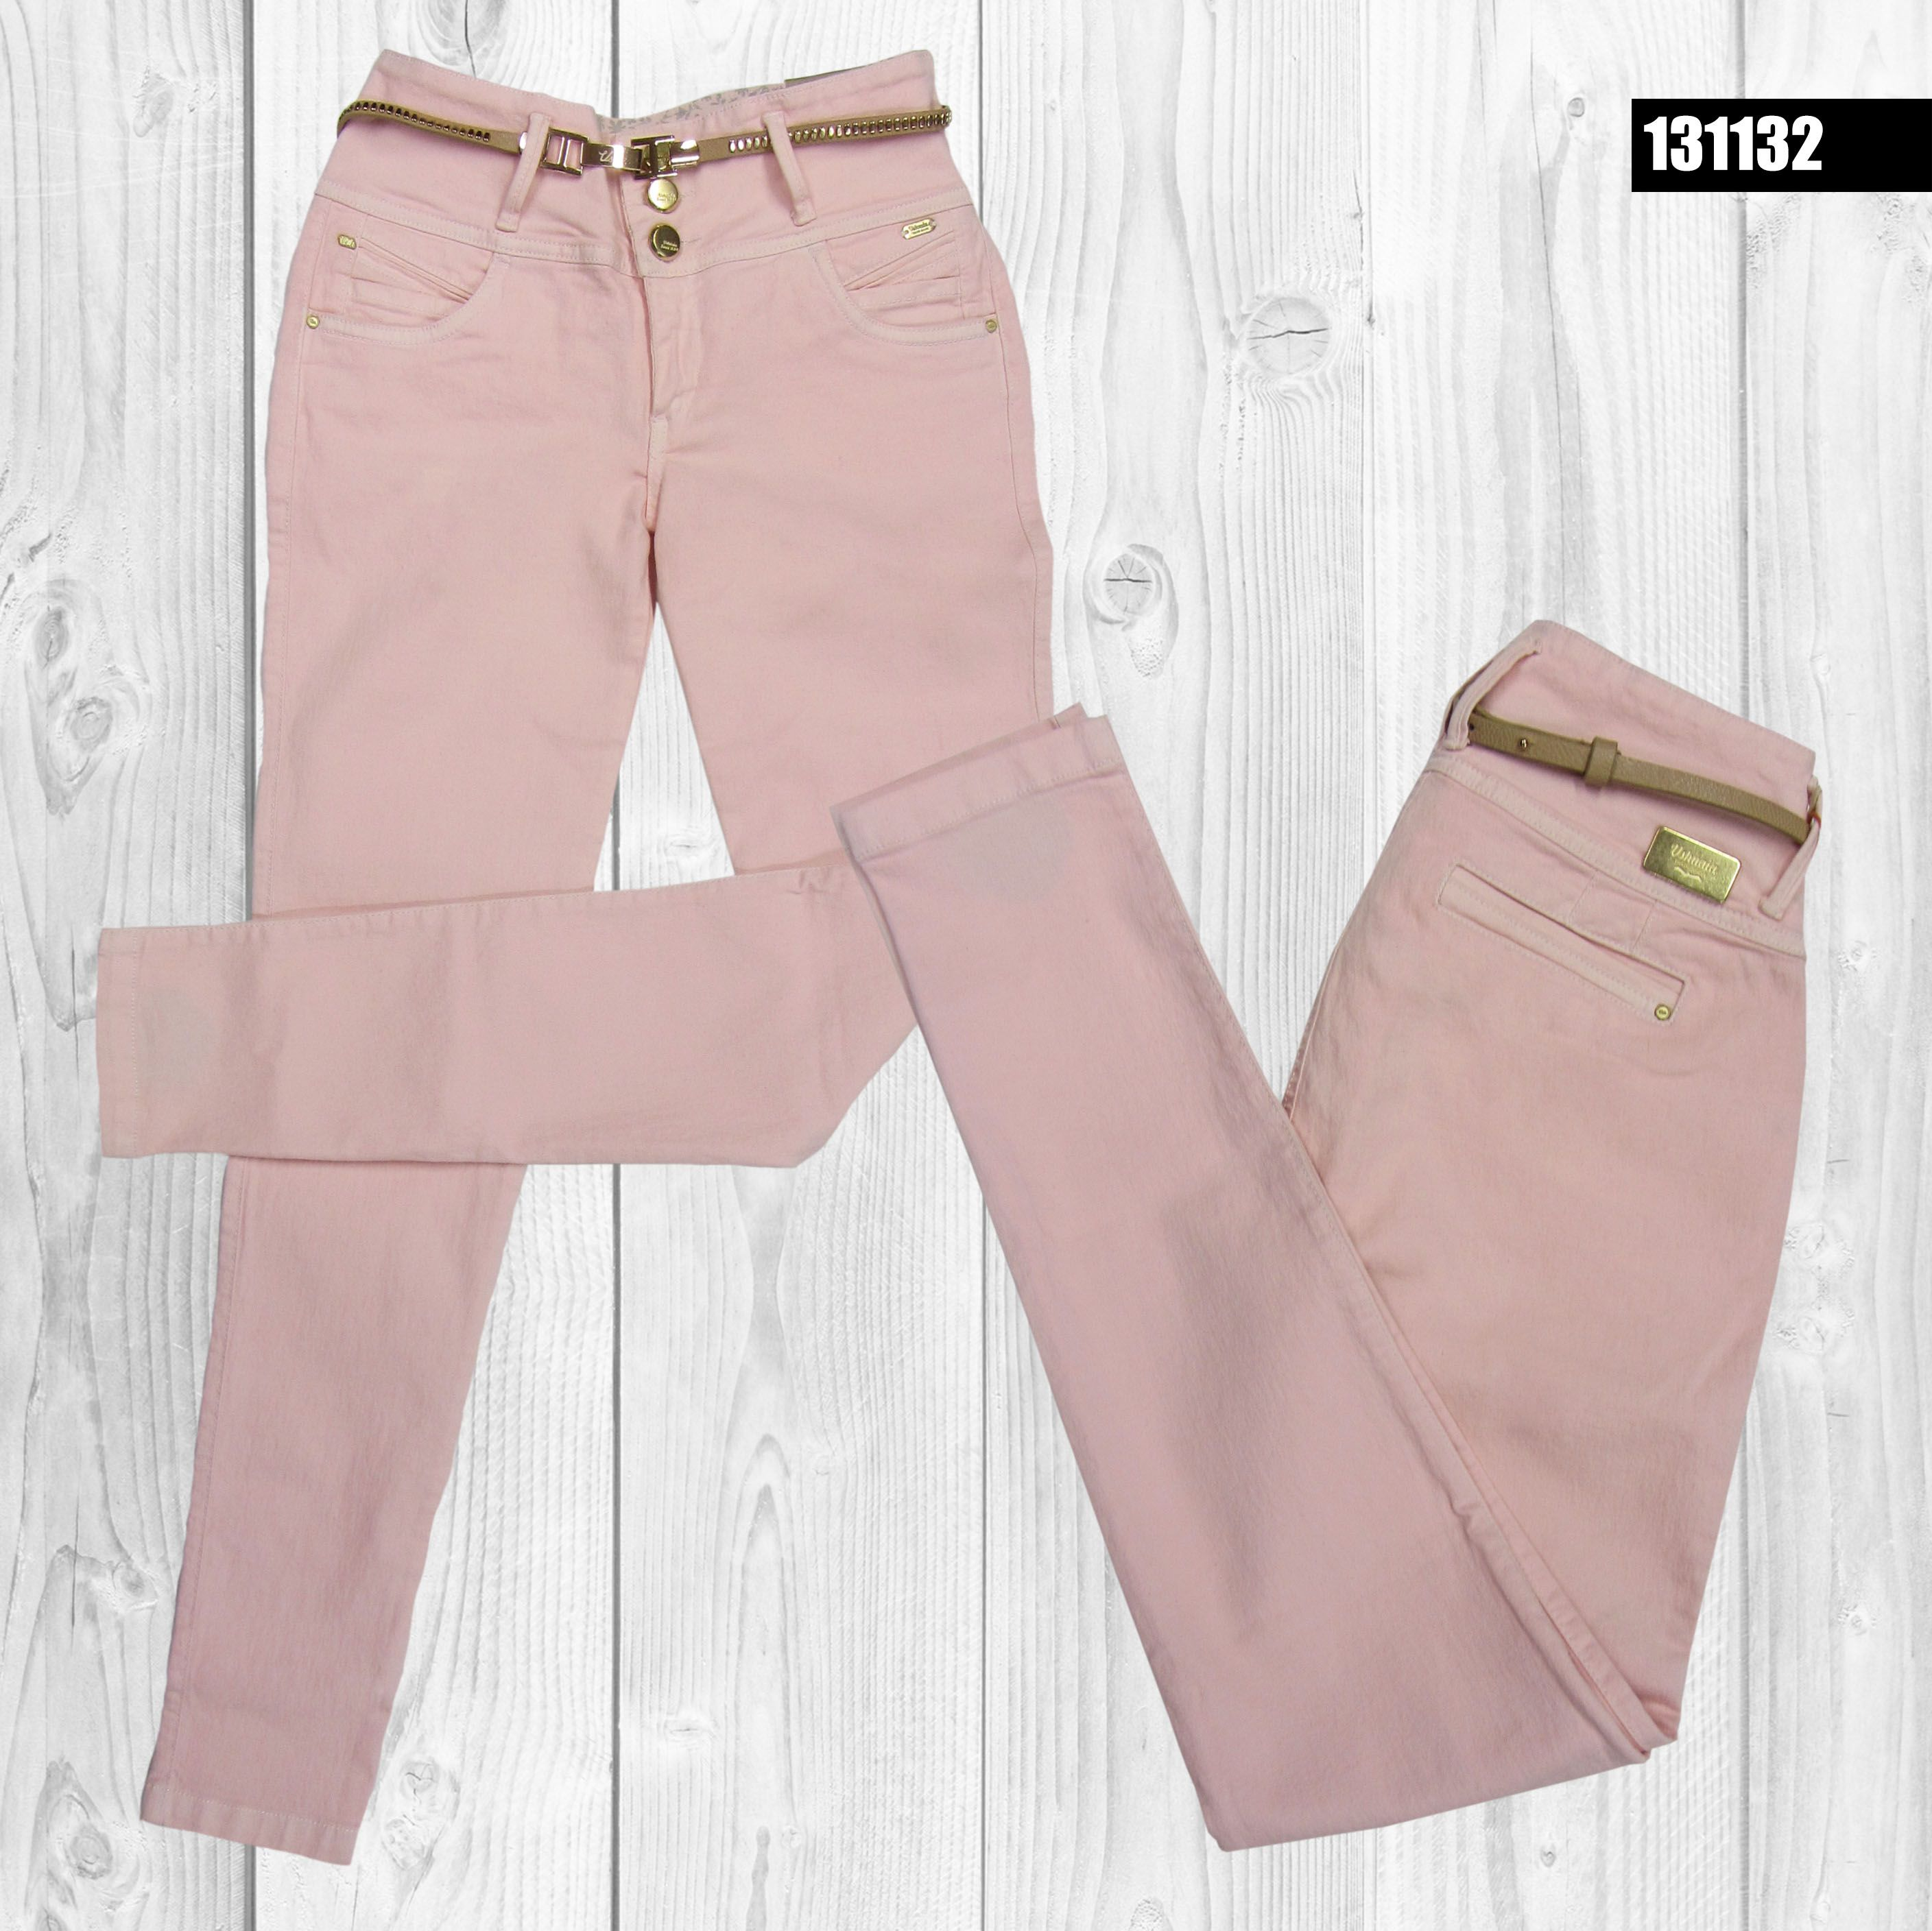 Pantalon Mujer Color Palo De Rosa 131132 Fashion Today Fashion Khaki Pants